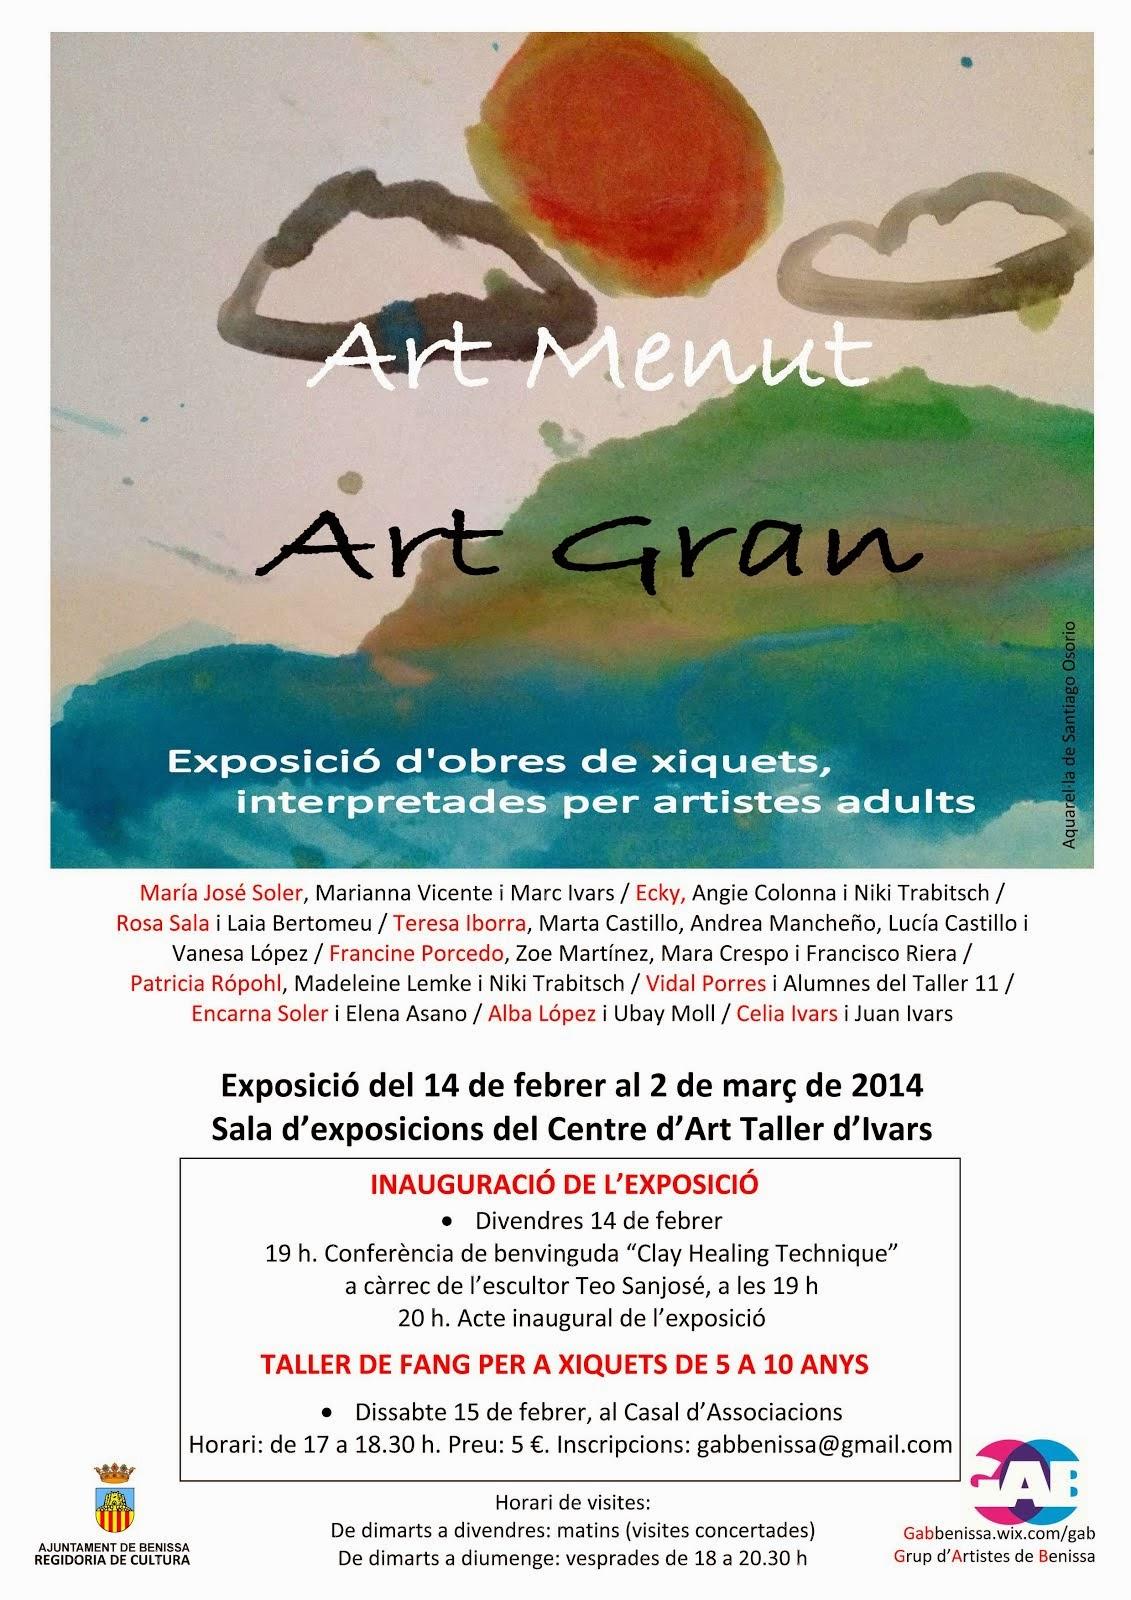 ART MENUT - ART GRAN